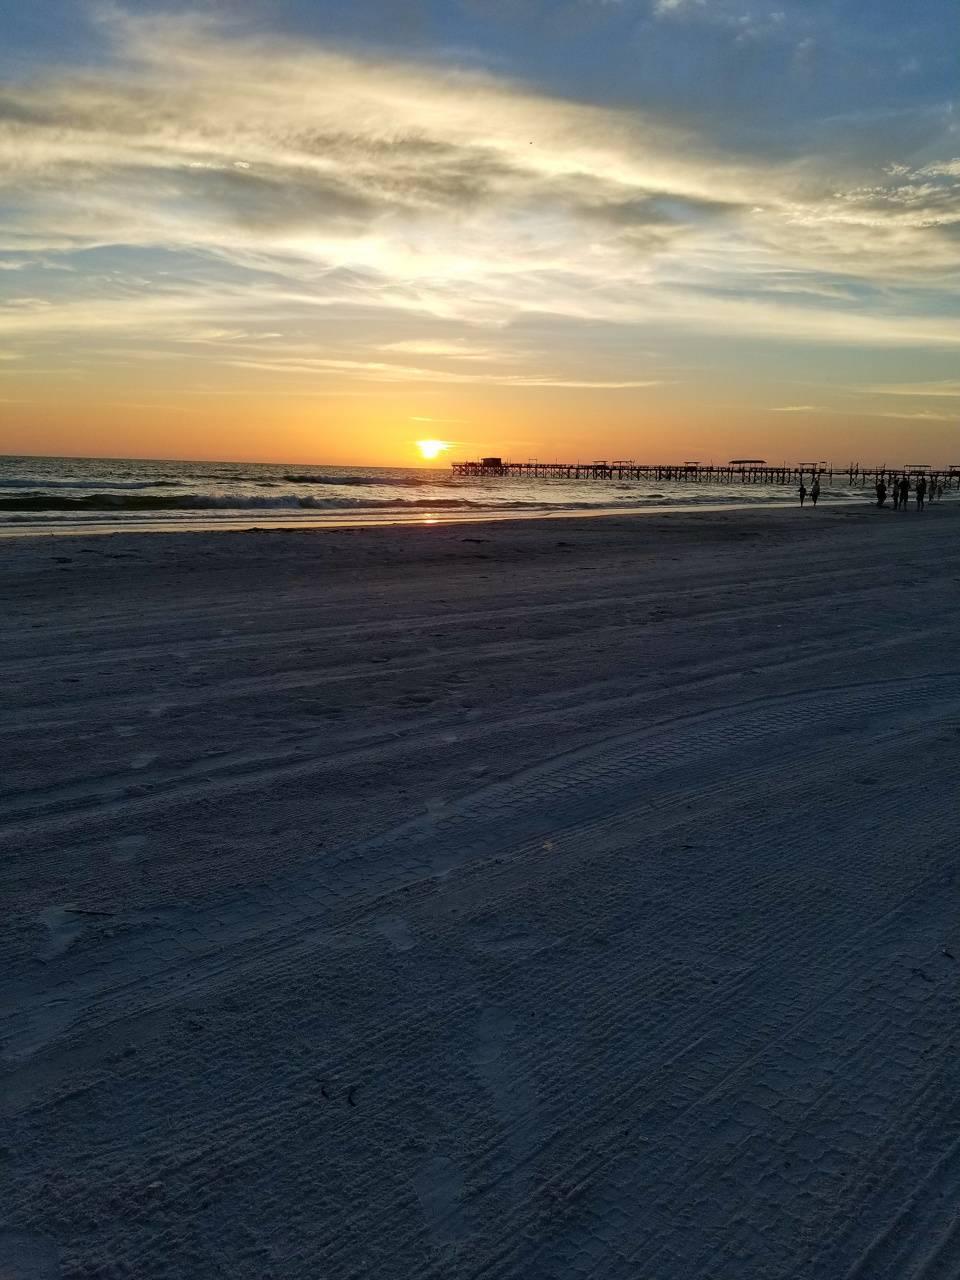 Ah Sunset